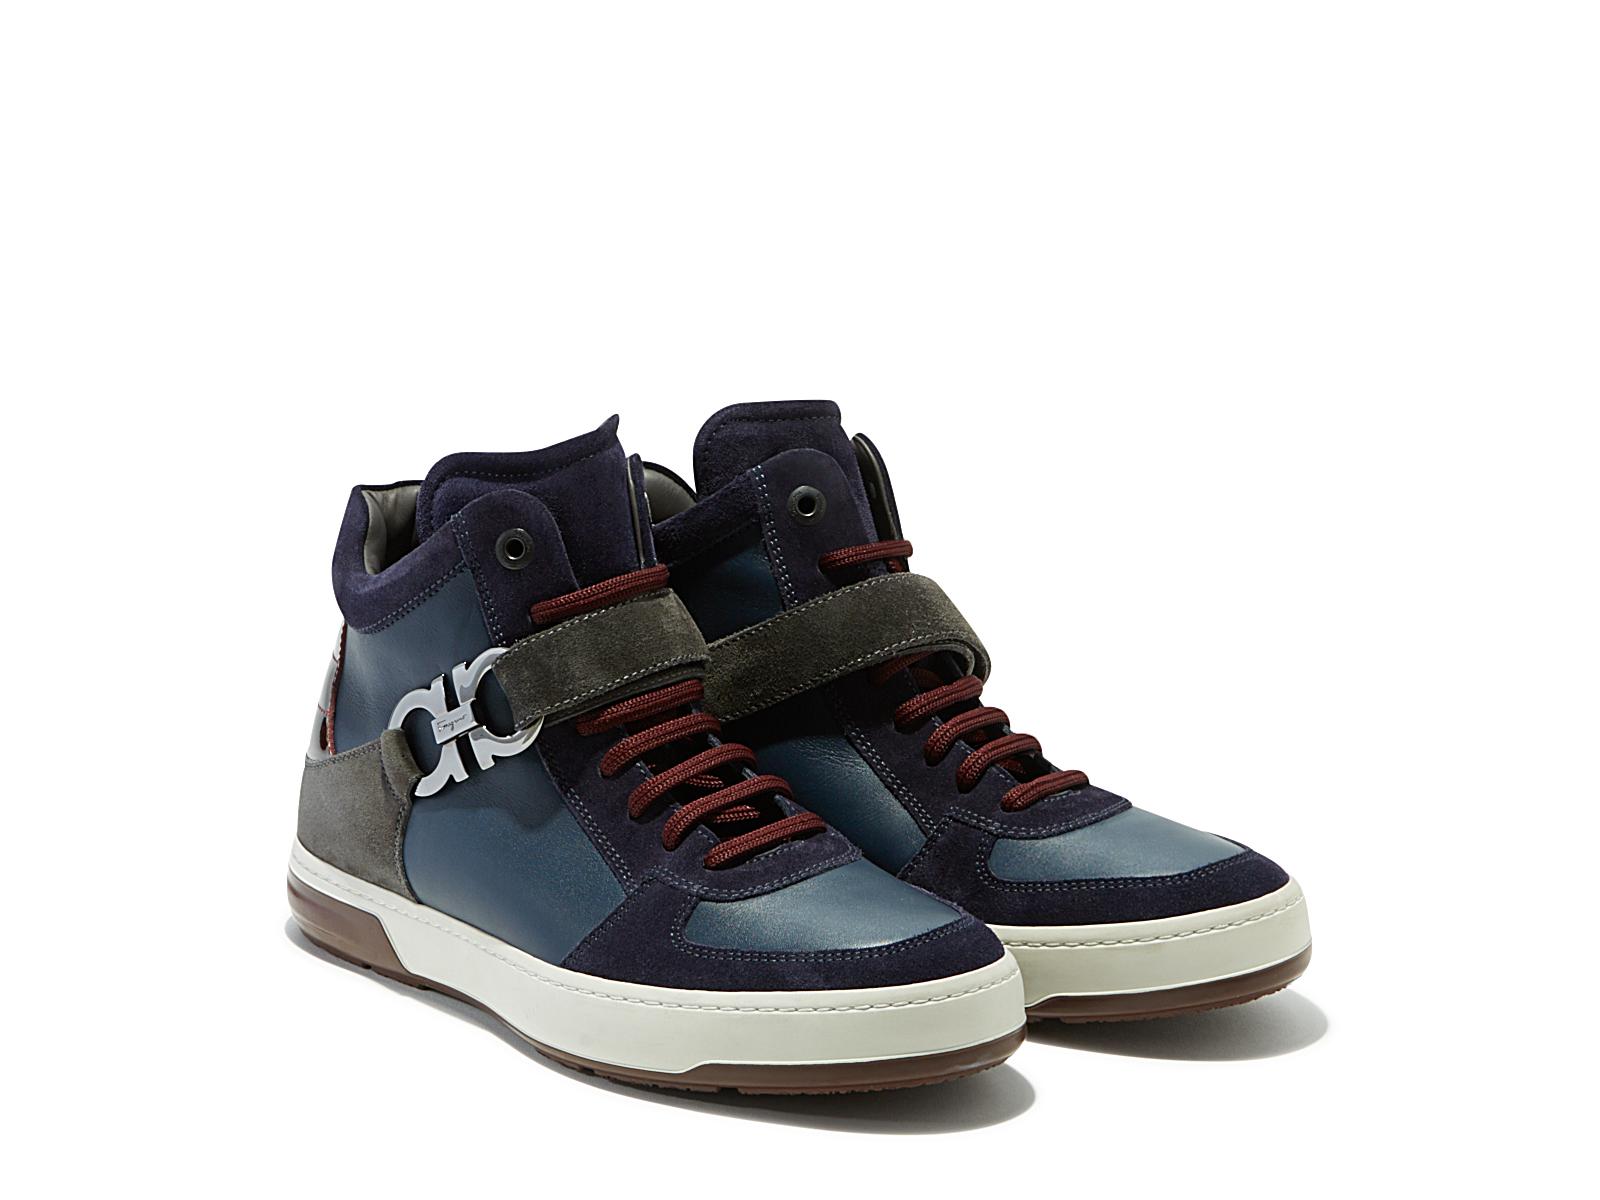 ferragamo high top sneaker in blue for men navy lyst. Black Bedroom Furniture Sets. Home Design Ideas